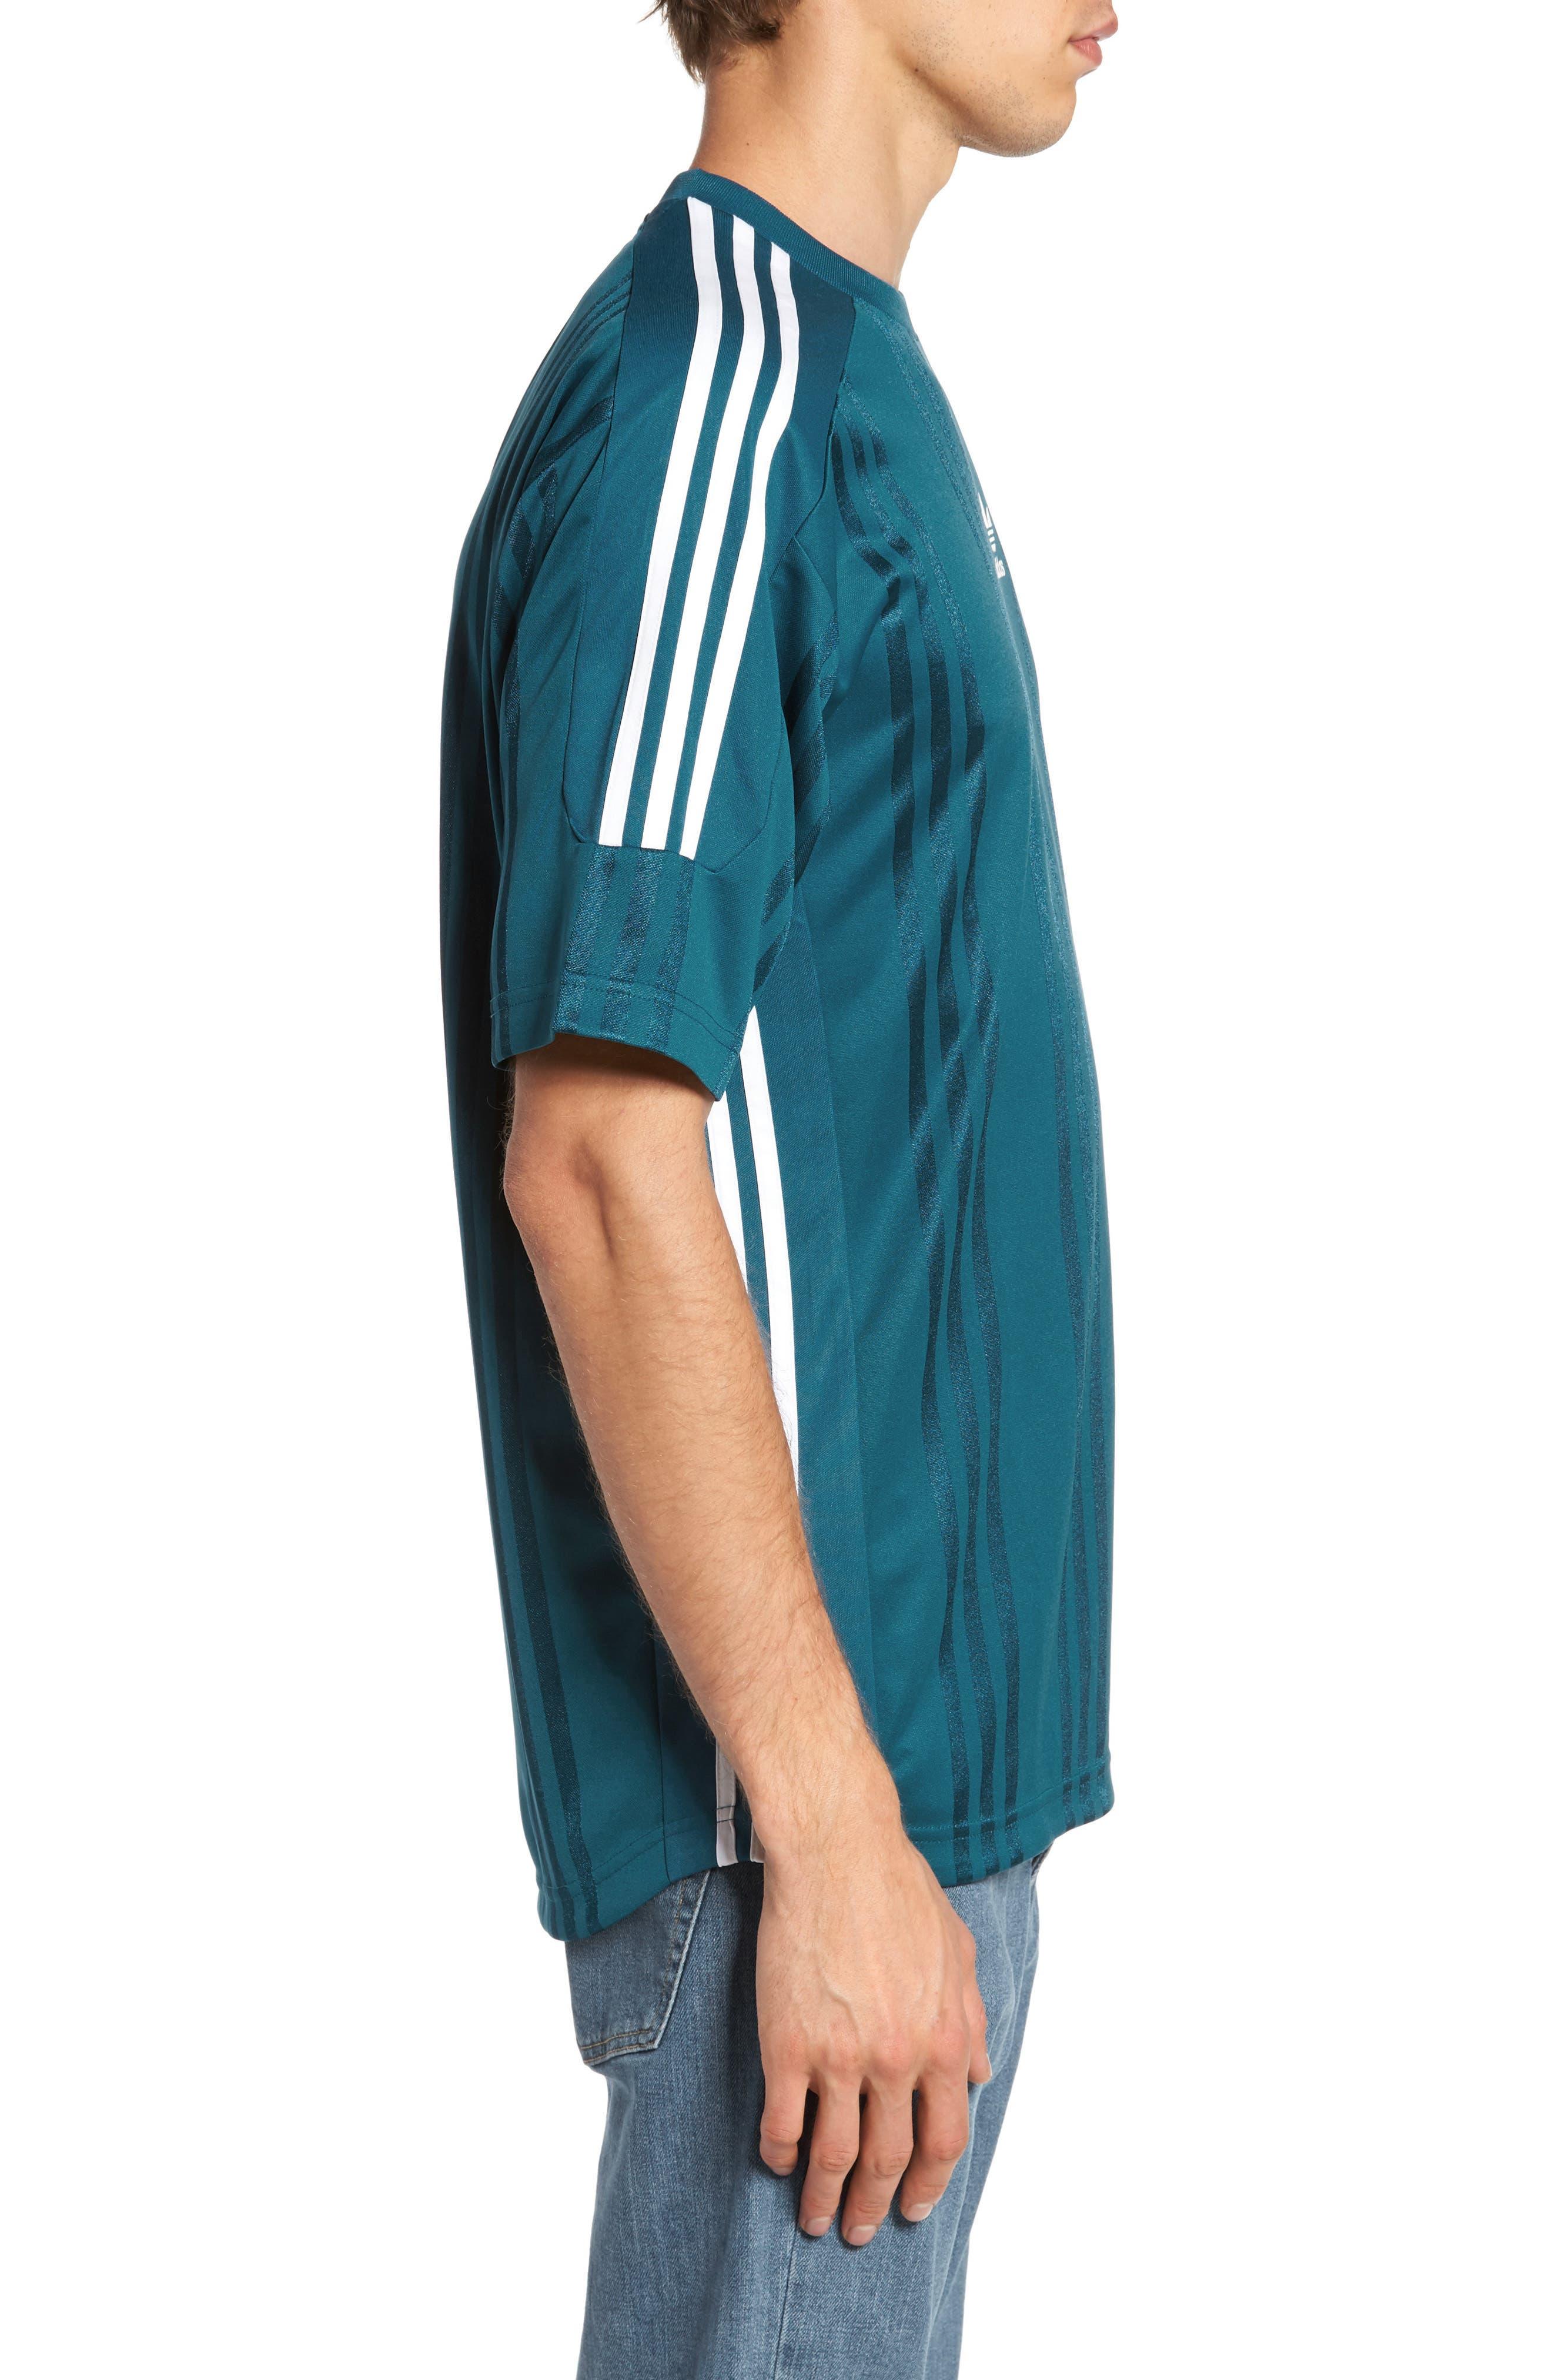 Originals Jacquard Stripe T-Shirt,                             Alternate thumbnail 3, color,                             Real Teal